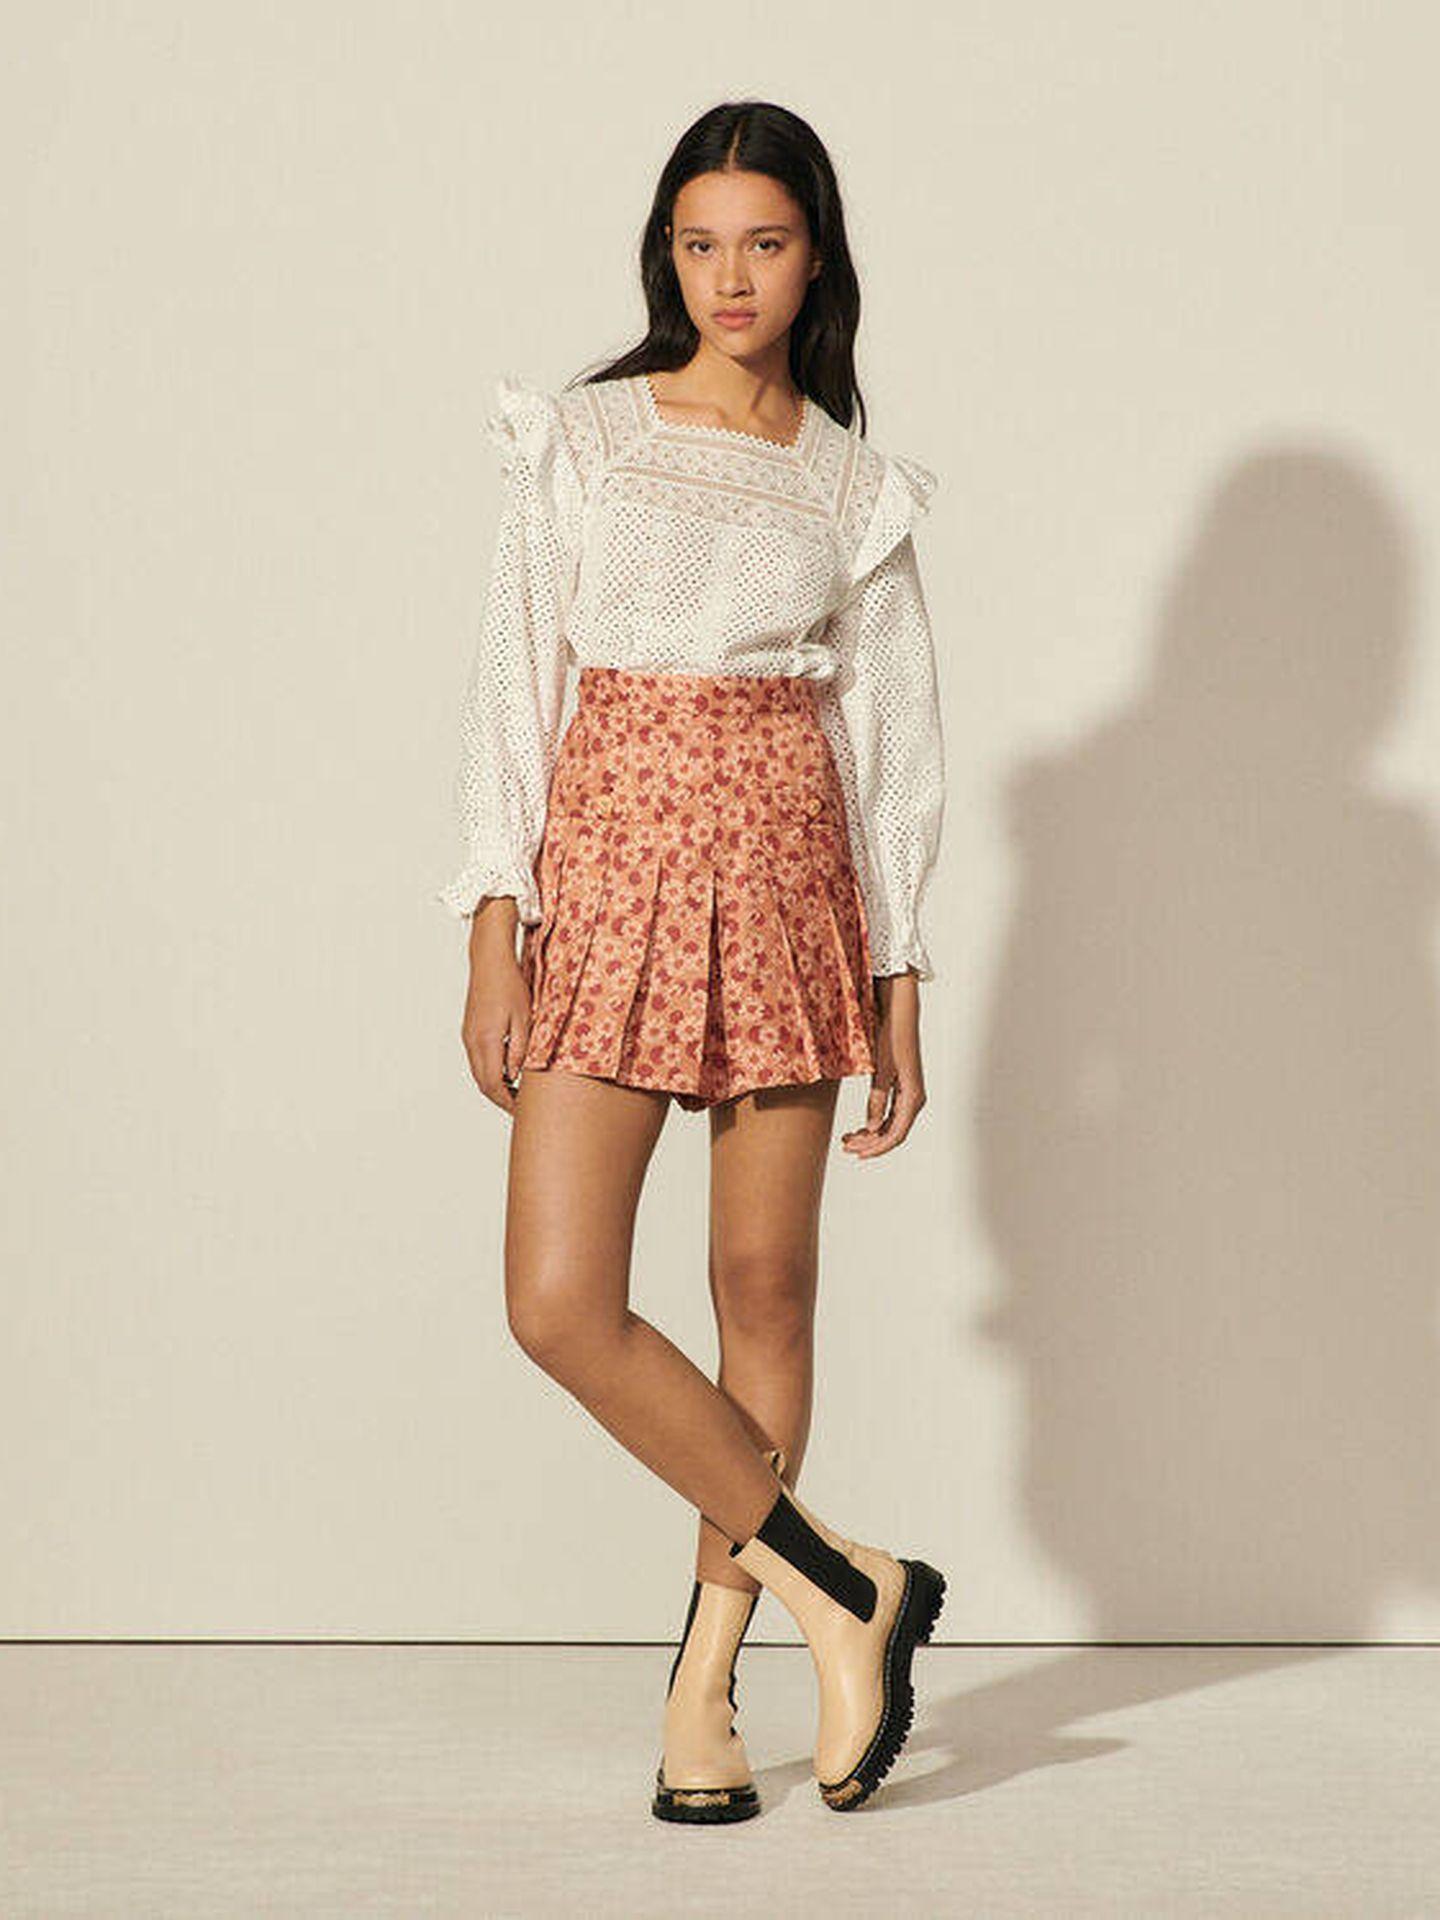 Falda pantalón de Sandro. (Cortesía)